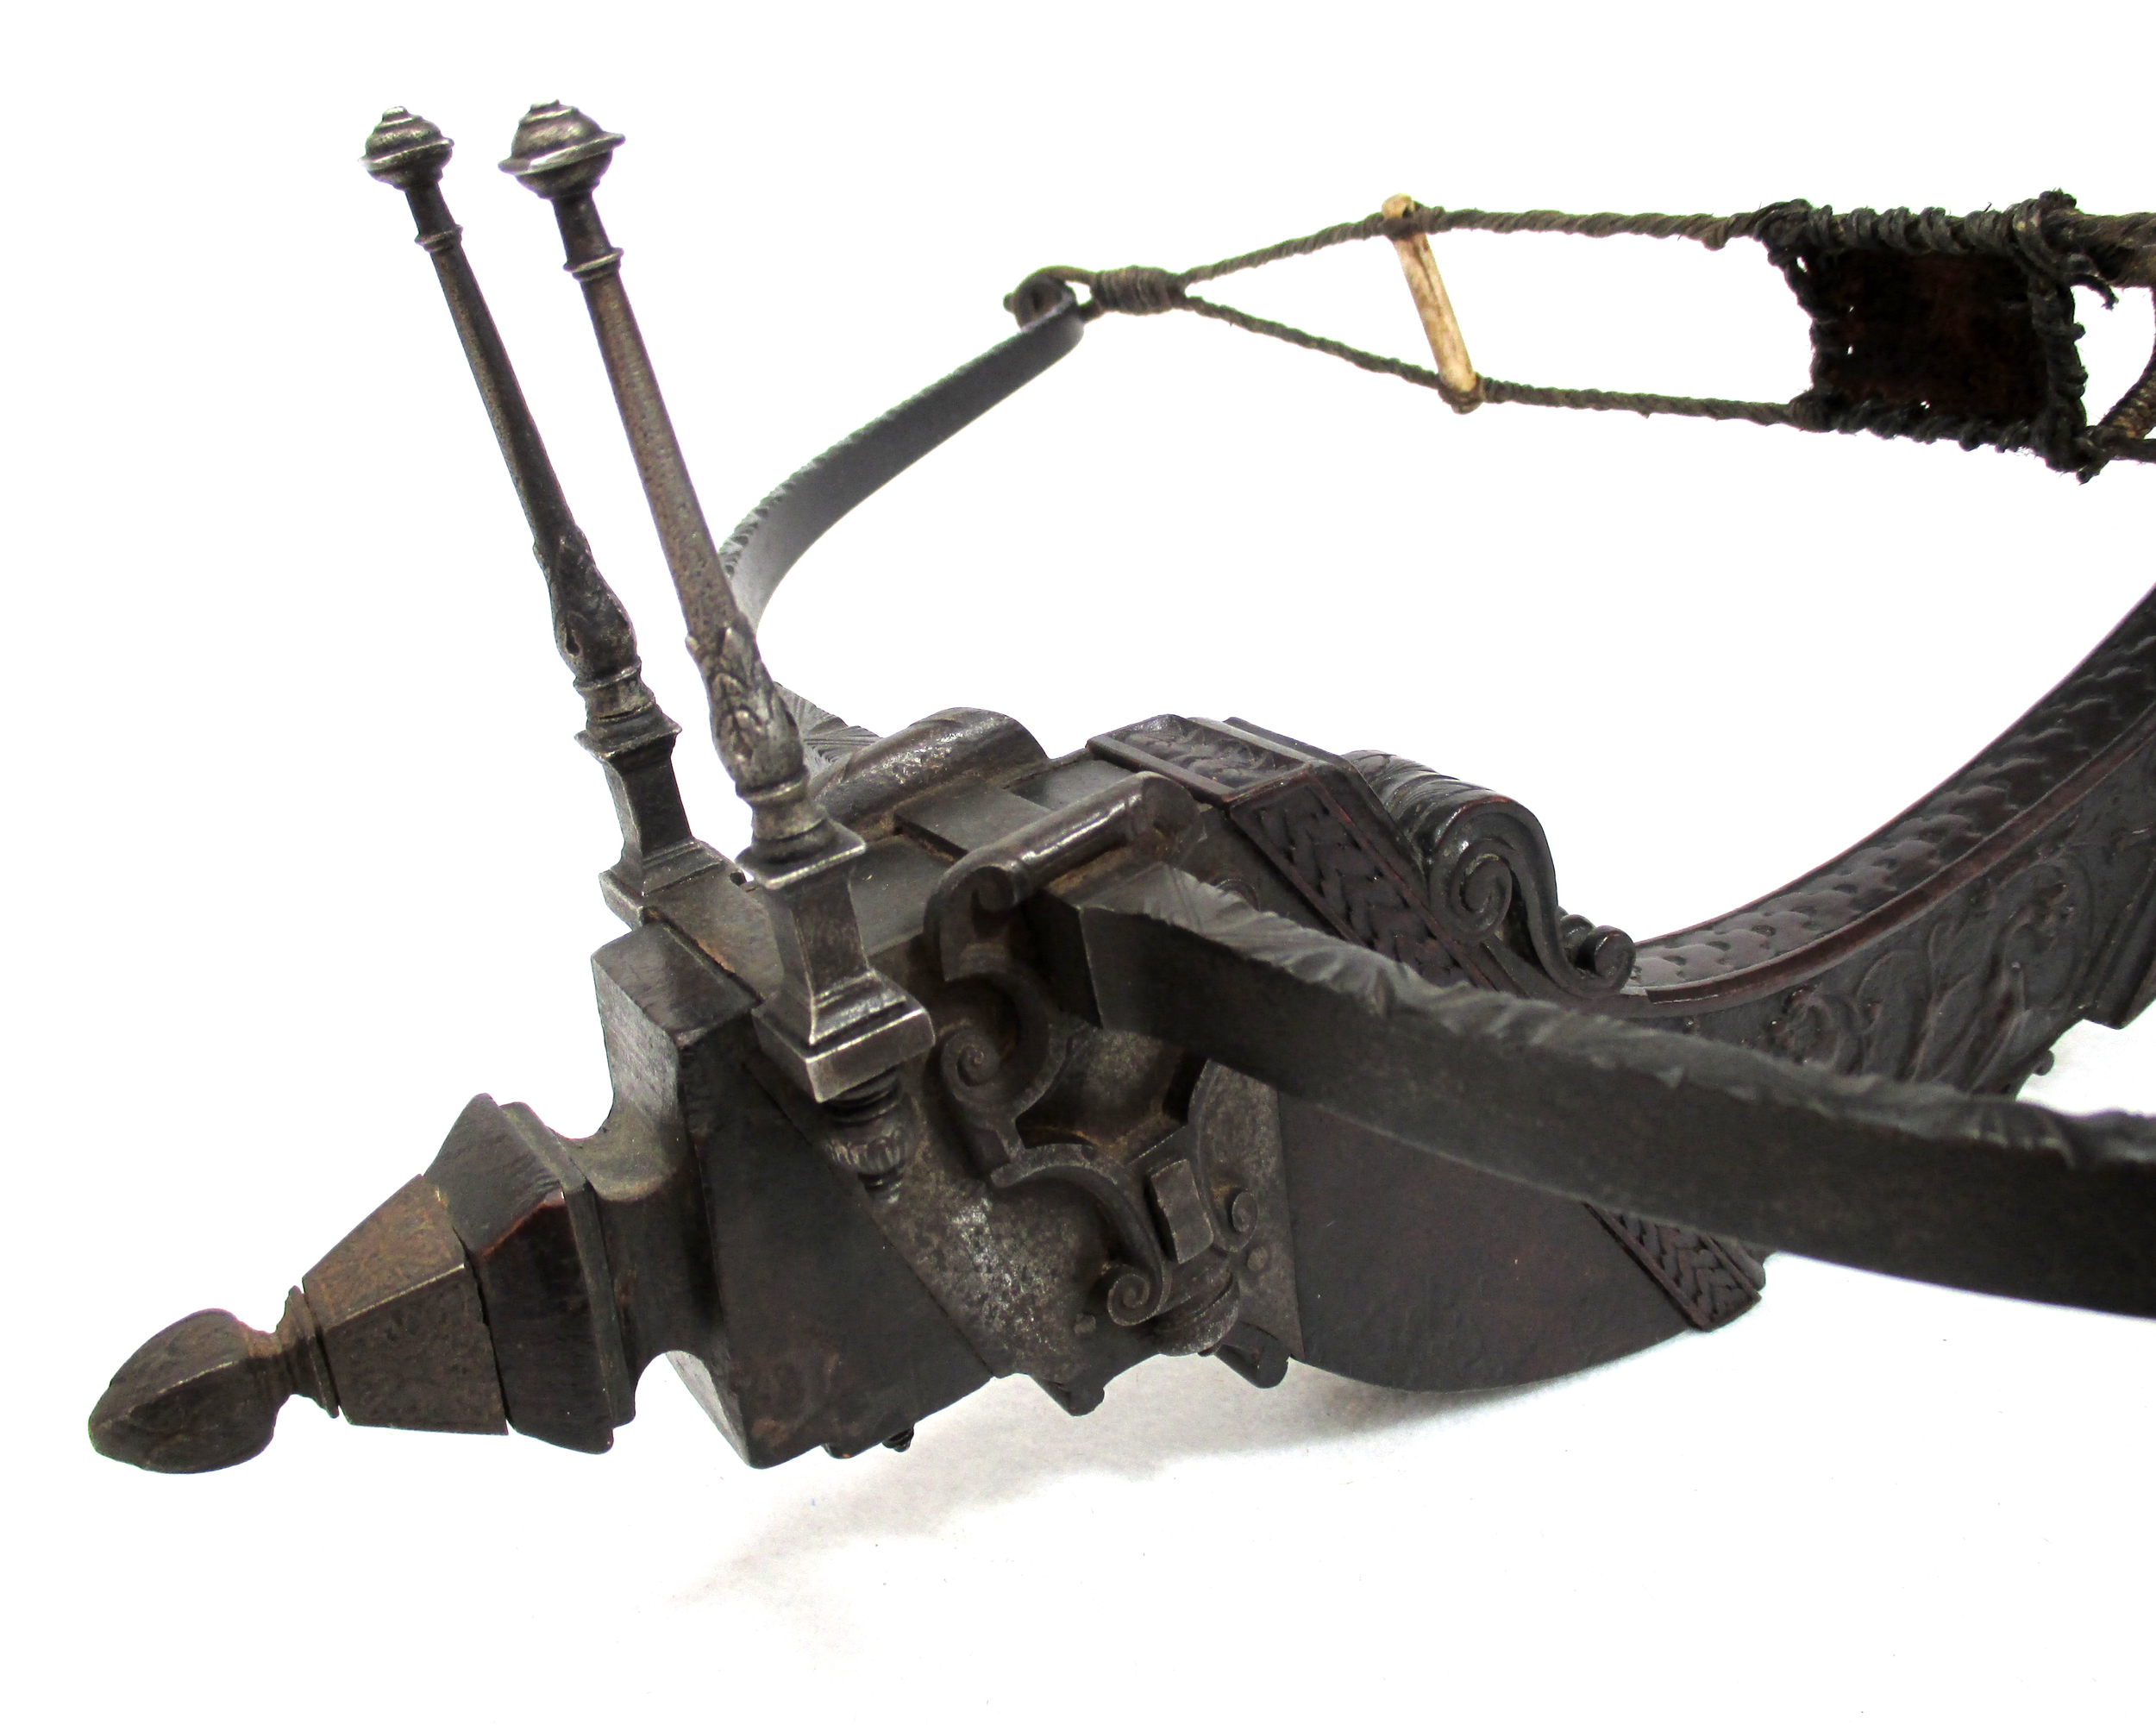 italian-stonebow-crossbow-tuscany-16thc-gary-friedland-arms-armor-weapons4.jpg